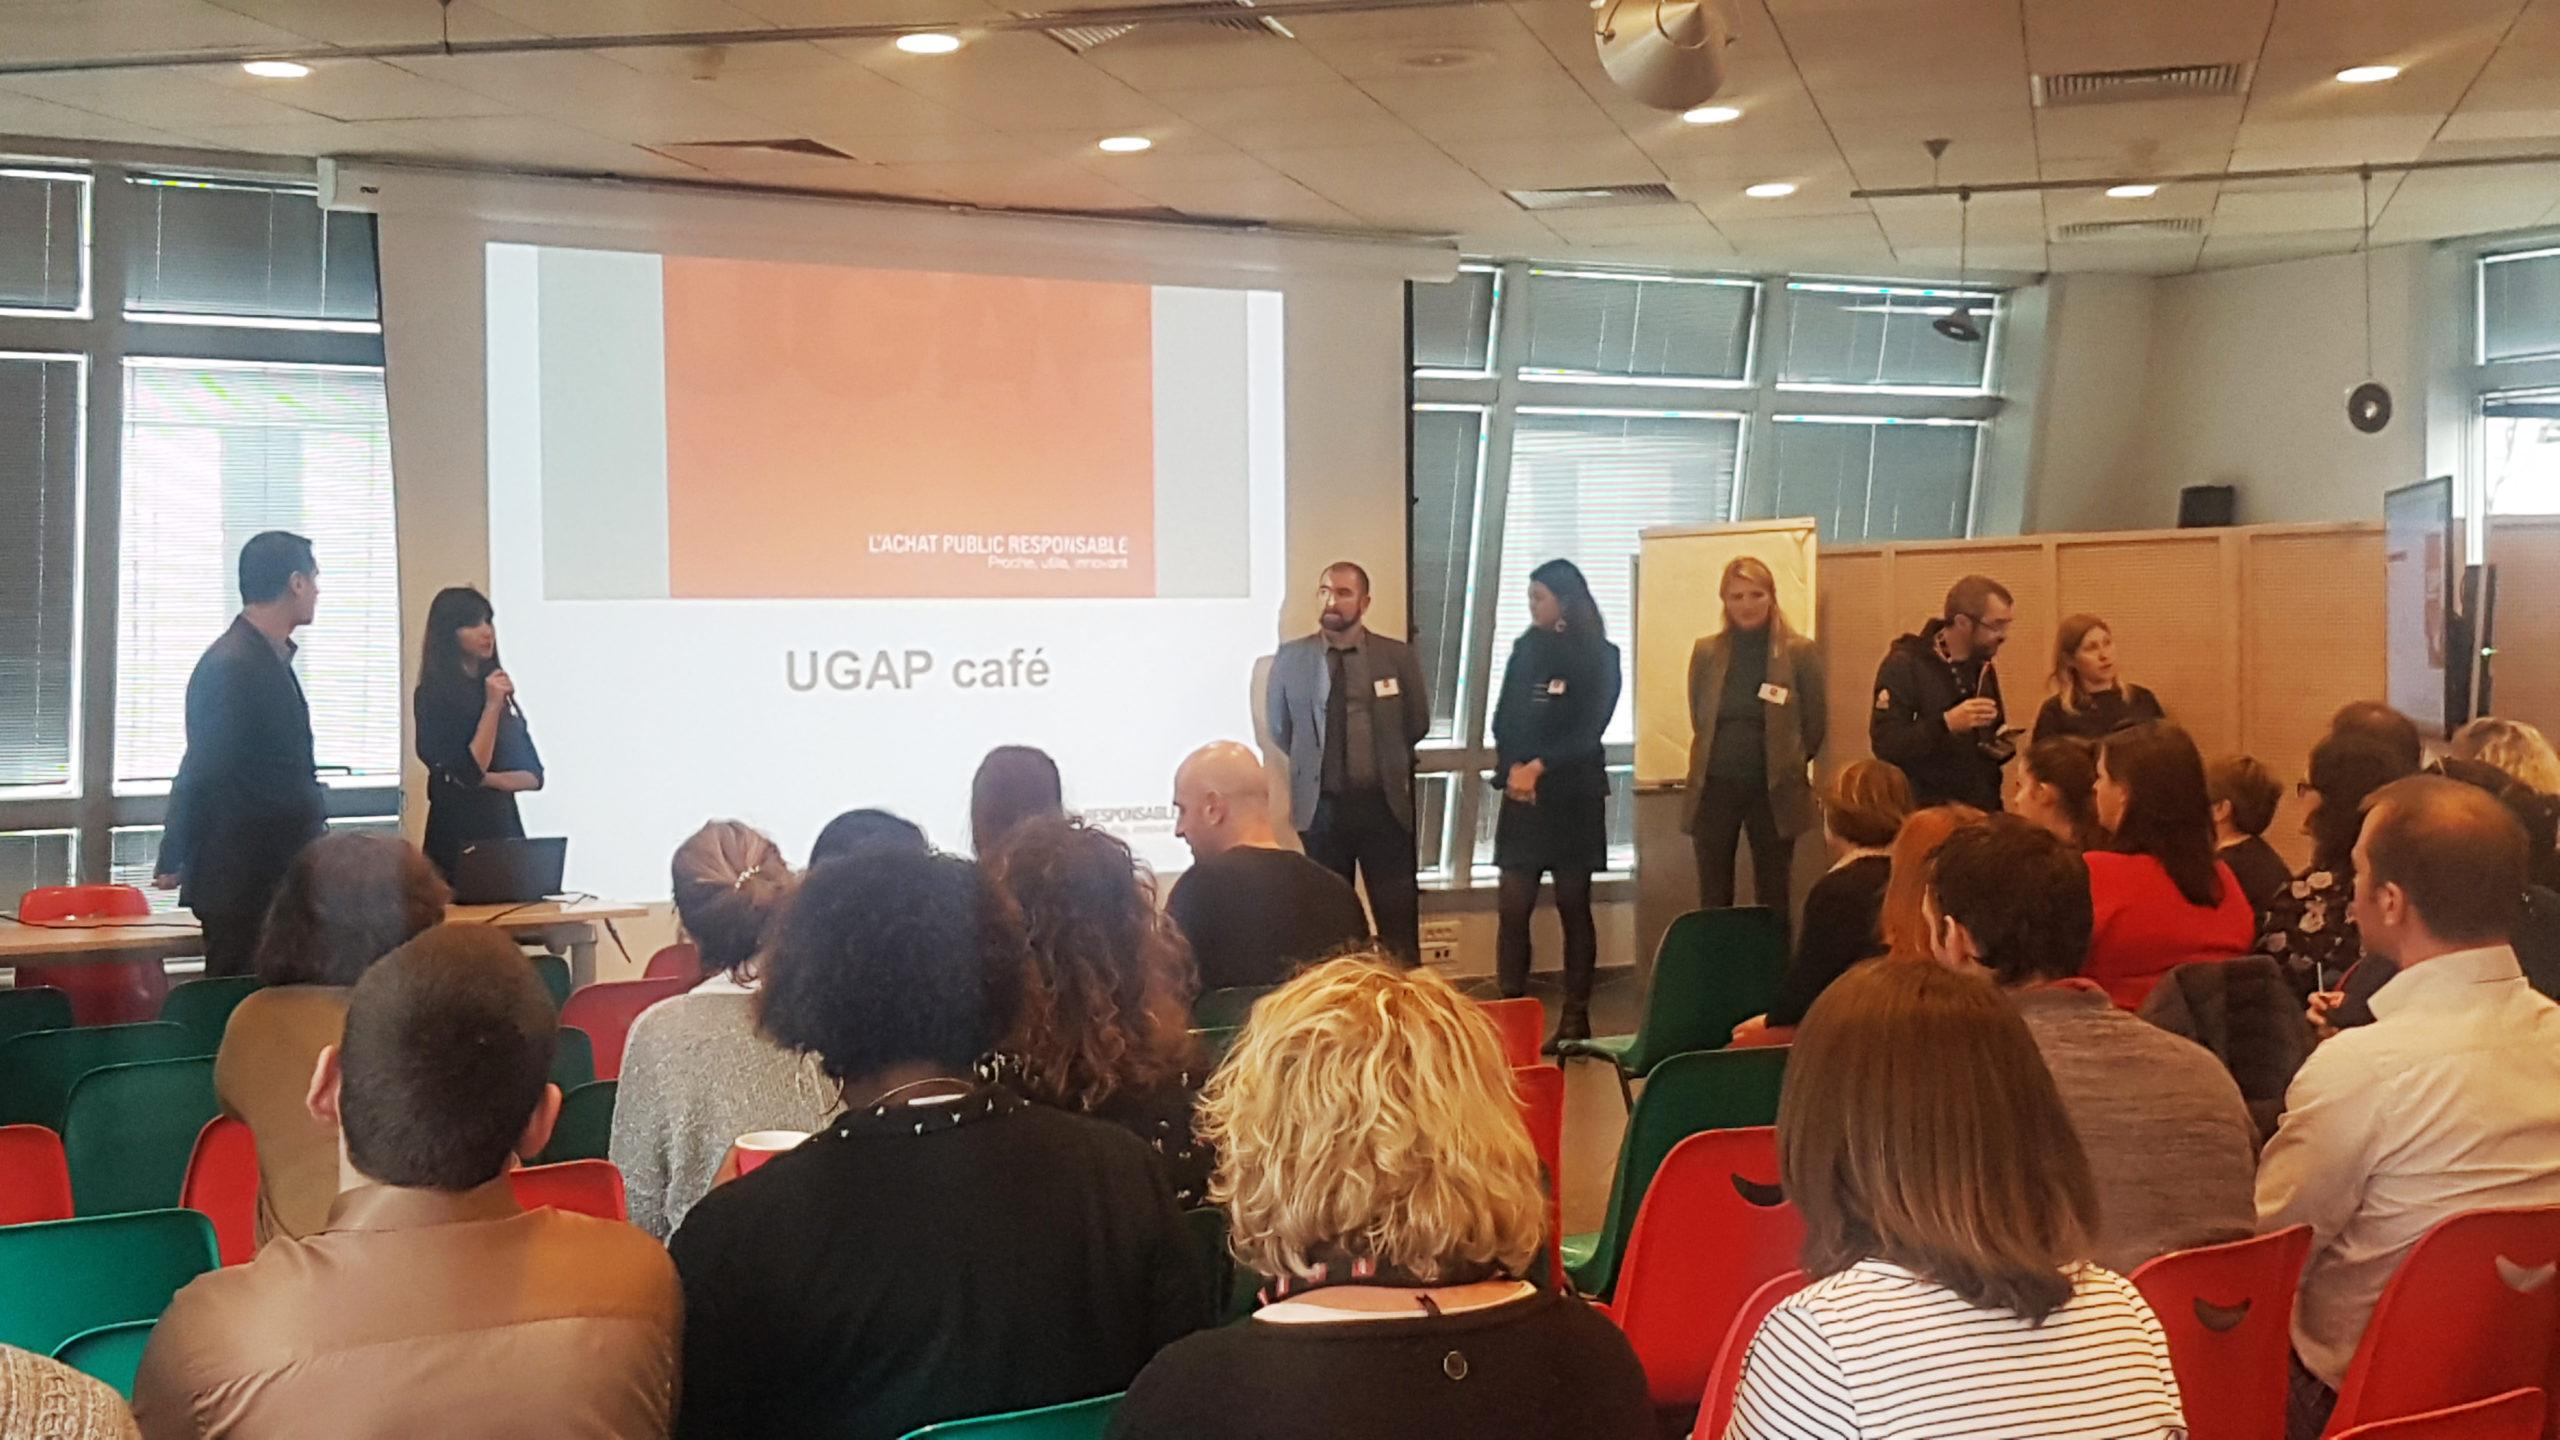 Conference UGAP Café